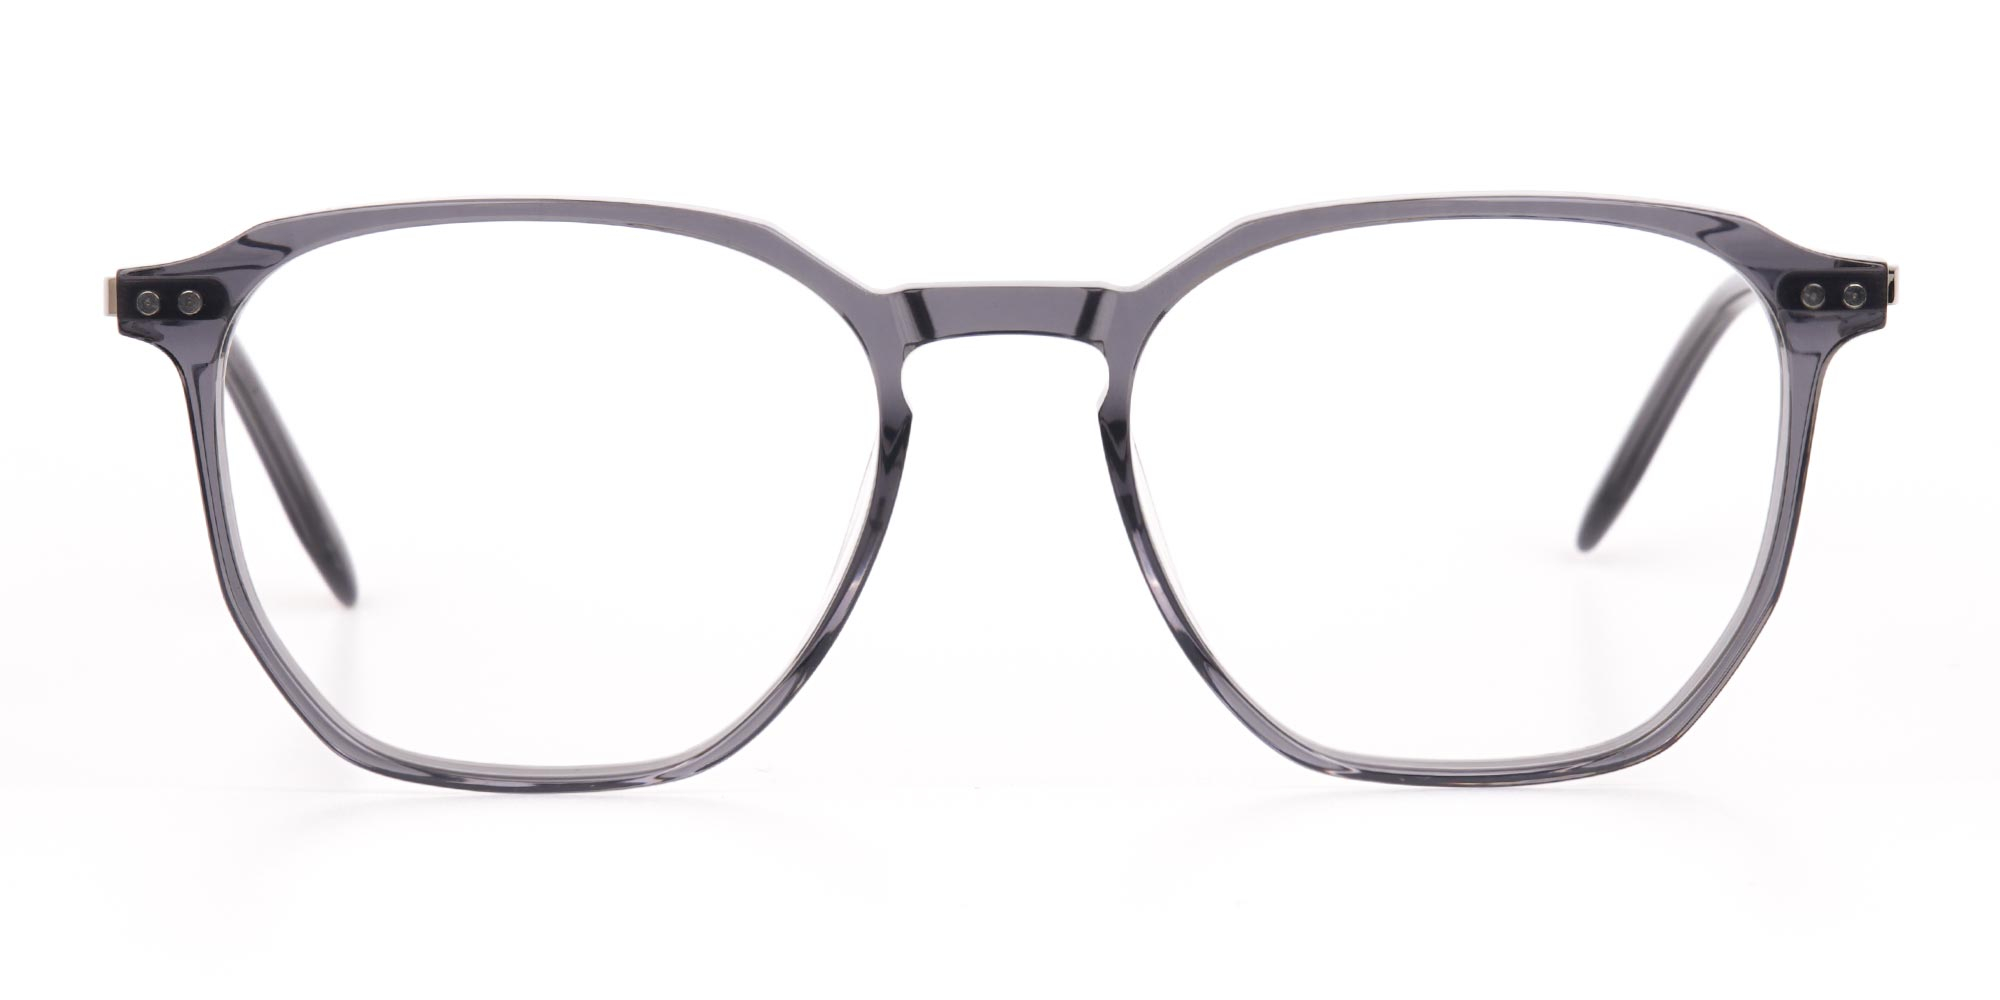 Silver Grey Geometric Eyeglasses Frame